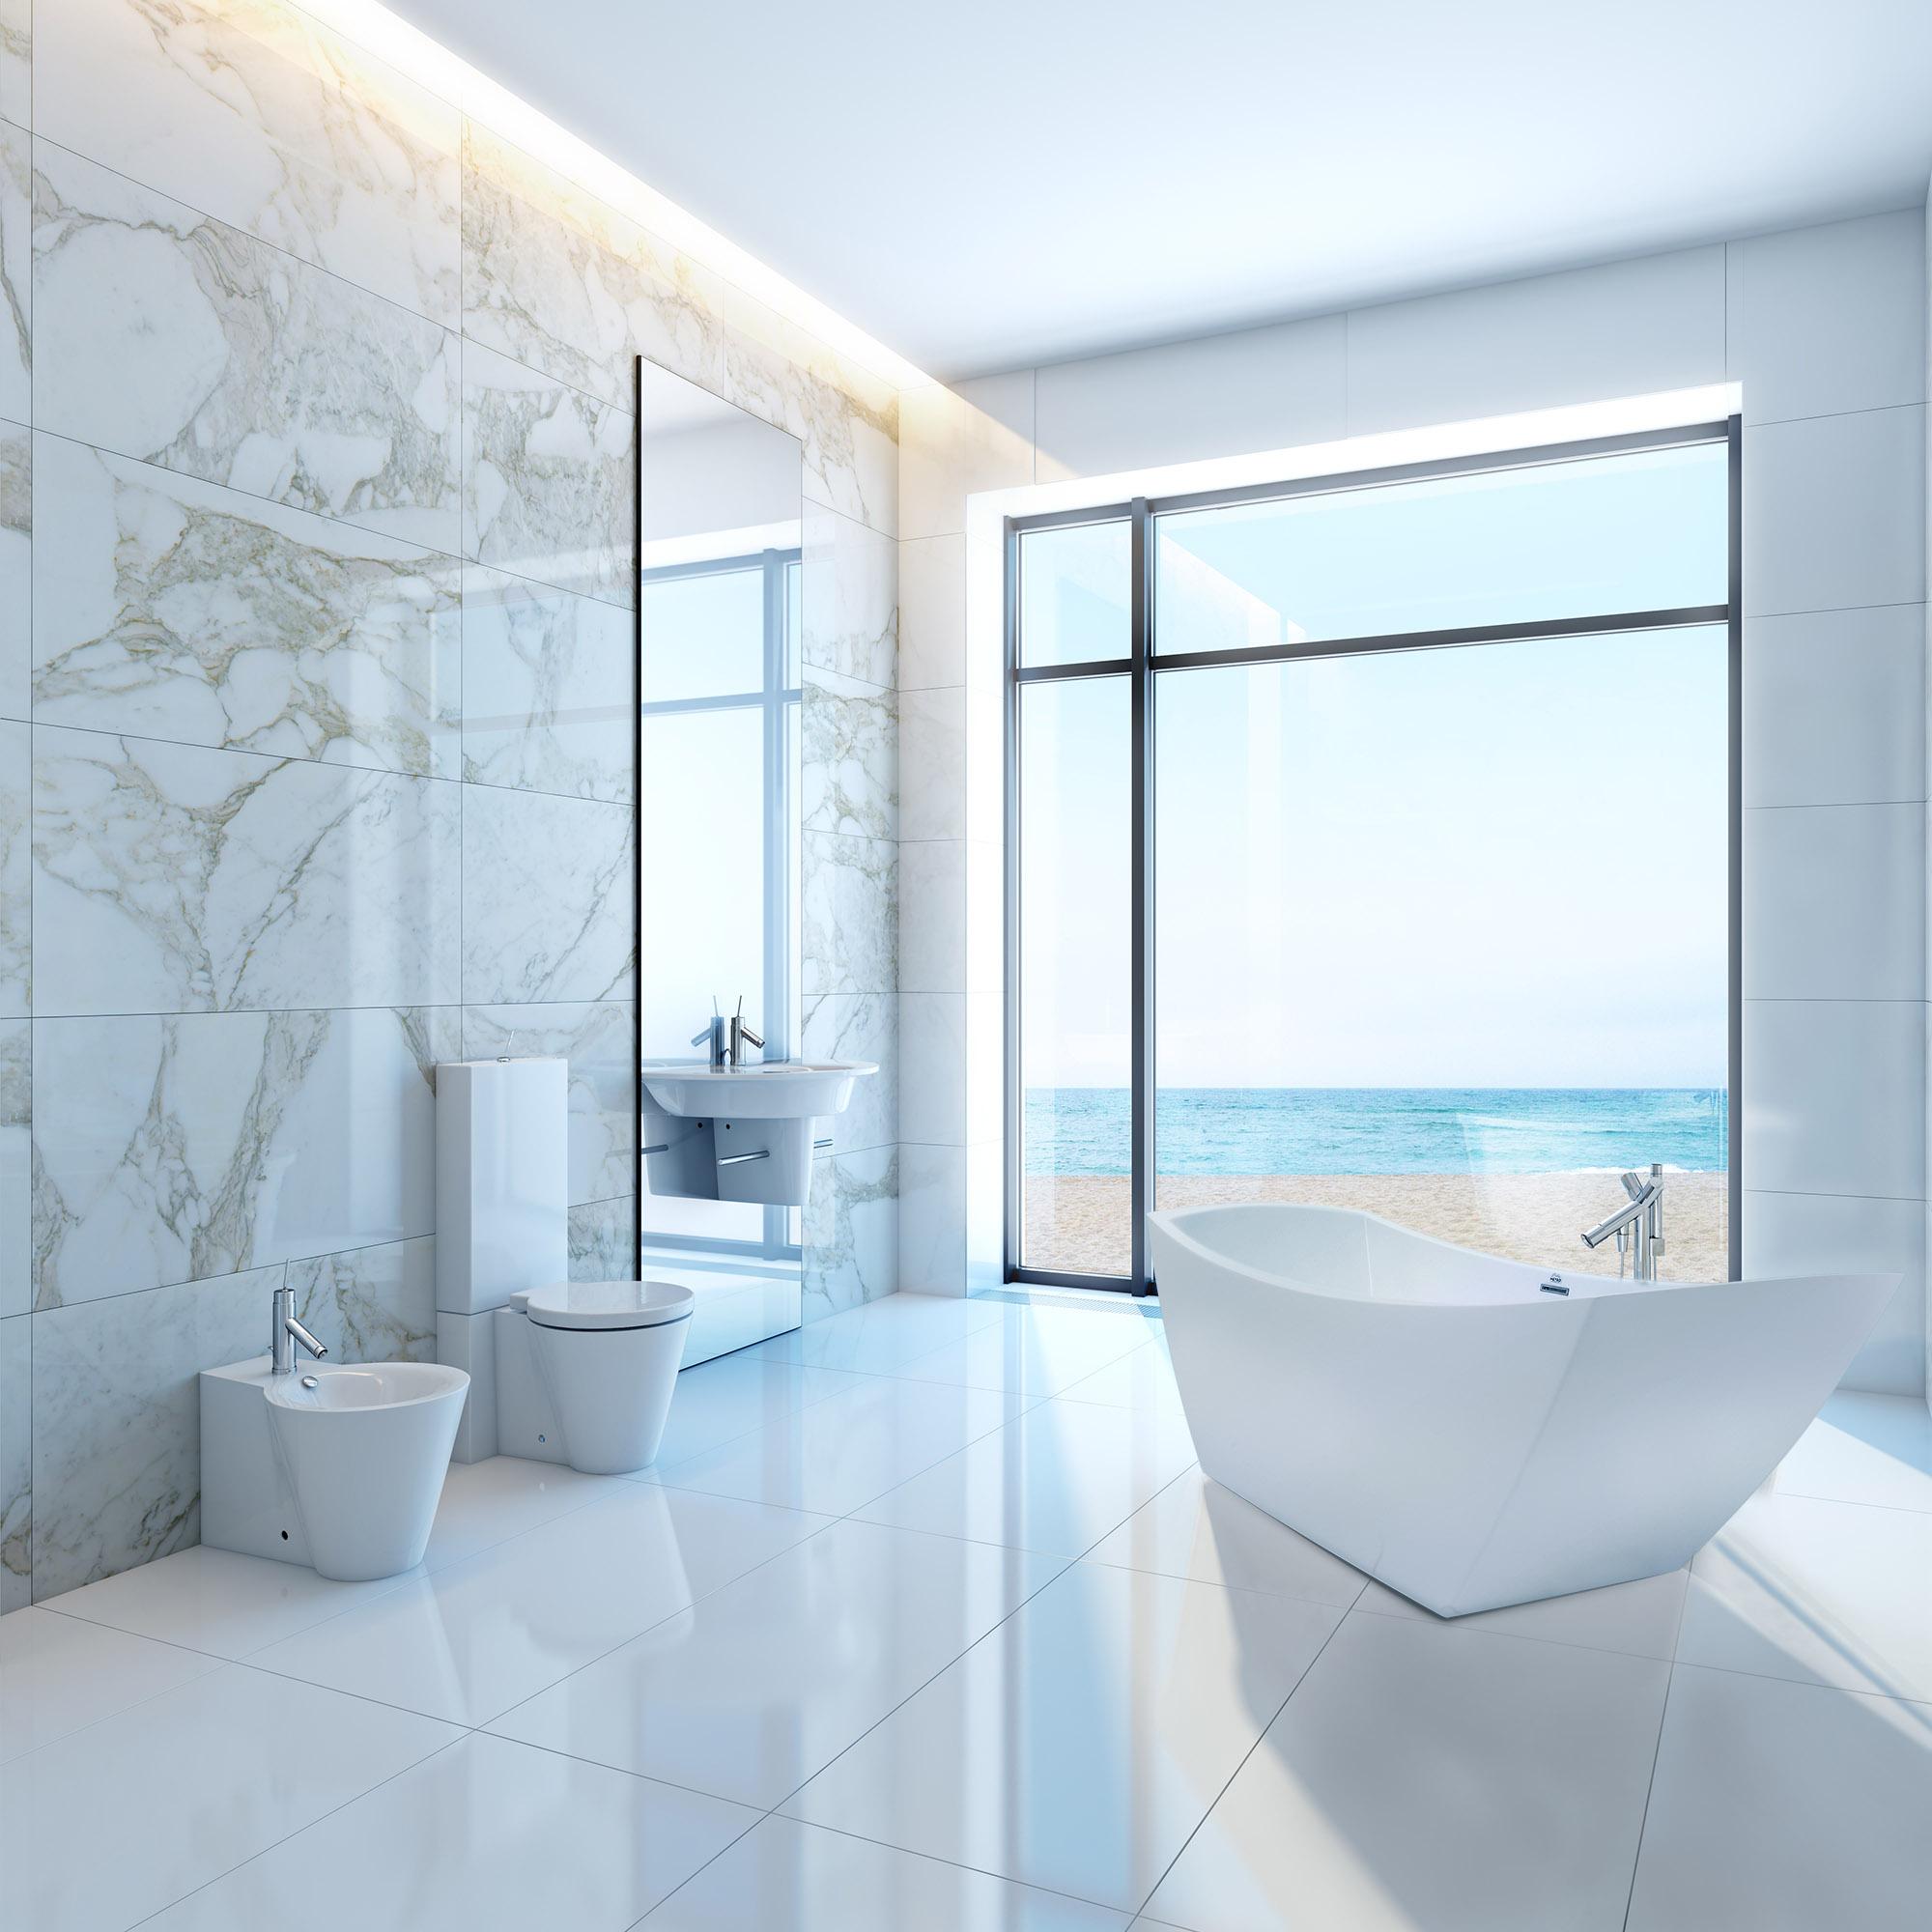 Nice Bathtub Shapes Model - Bathtub Ideas - dilata.info